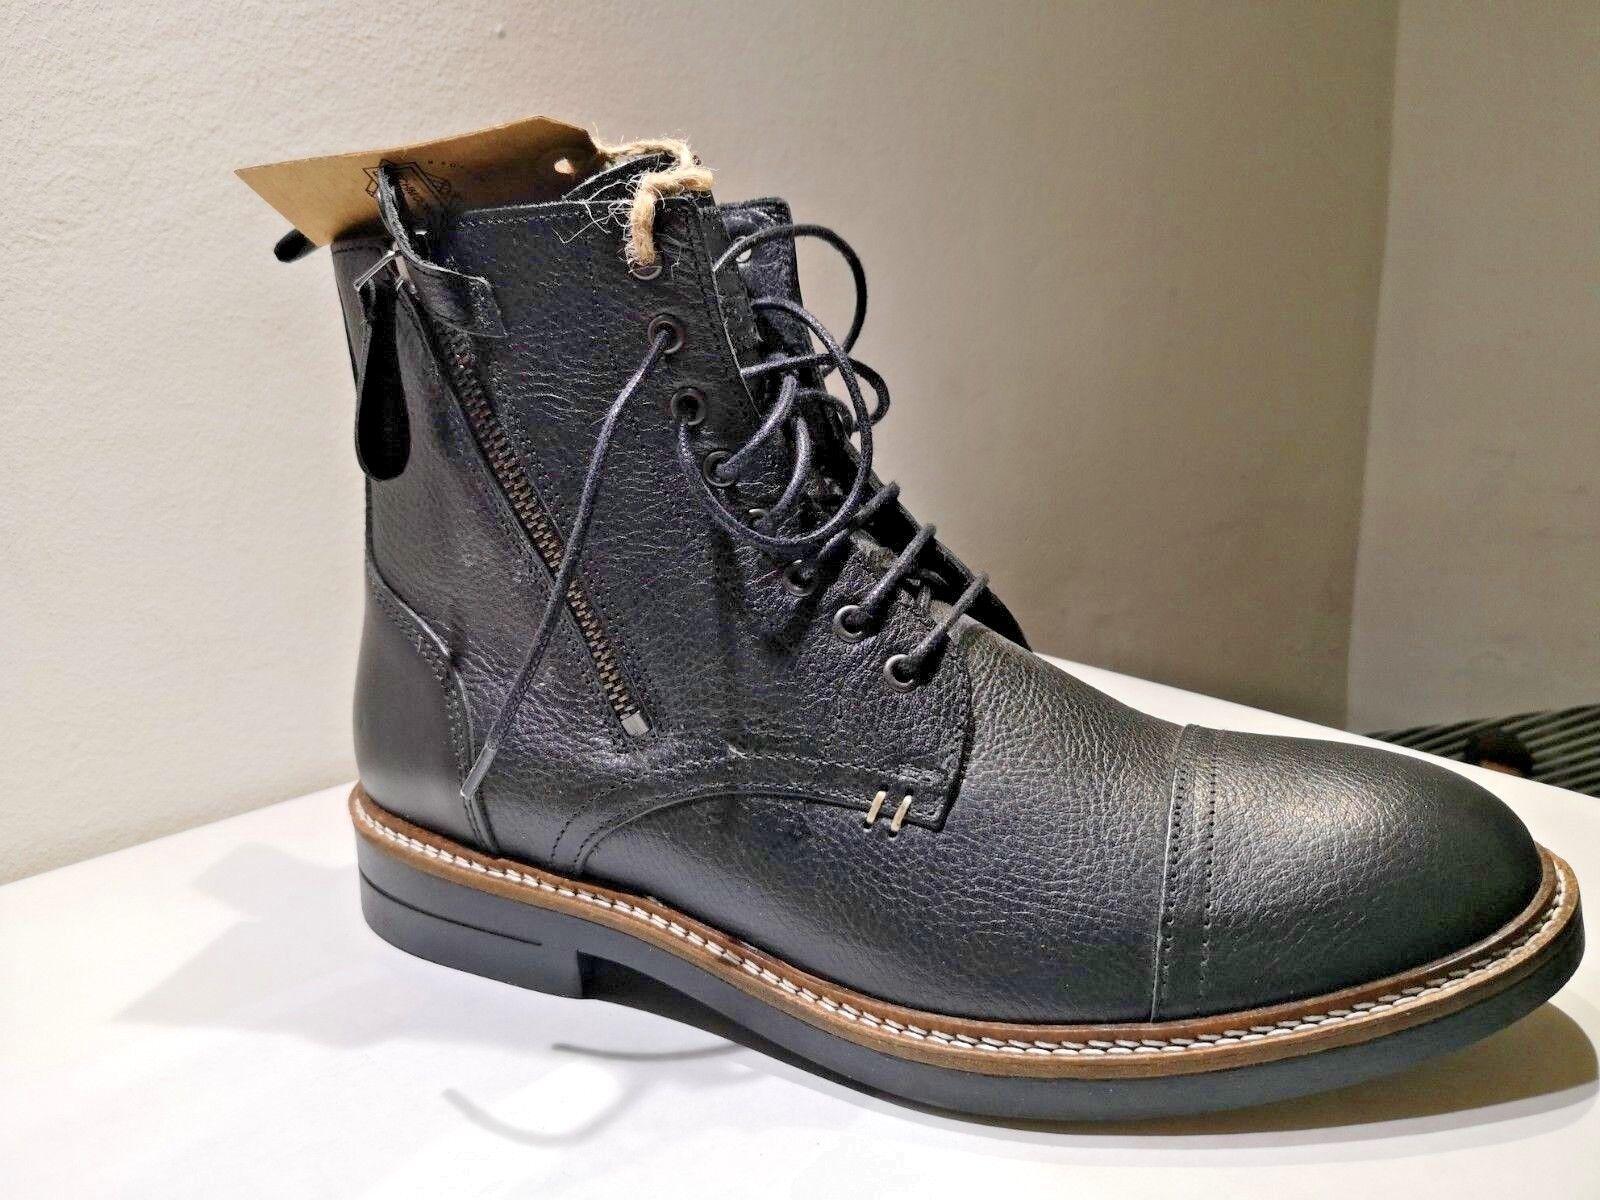 SCHMOOVE Stiefel Crew schwarzes Leder neu Wert 185E Schuhgrößen 40,41, 42